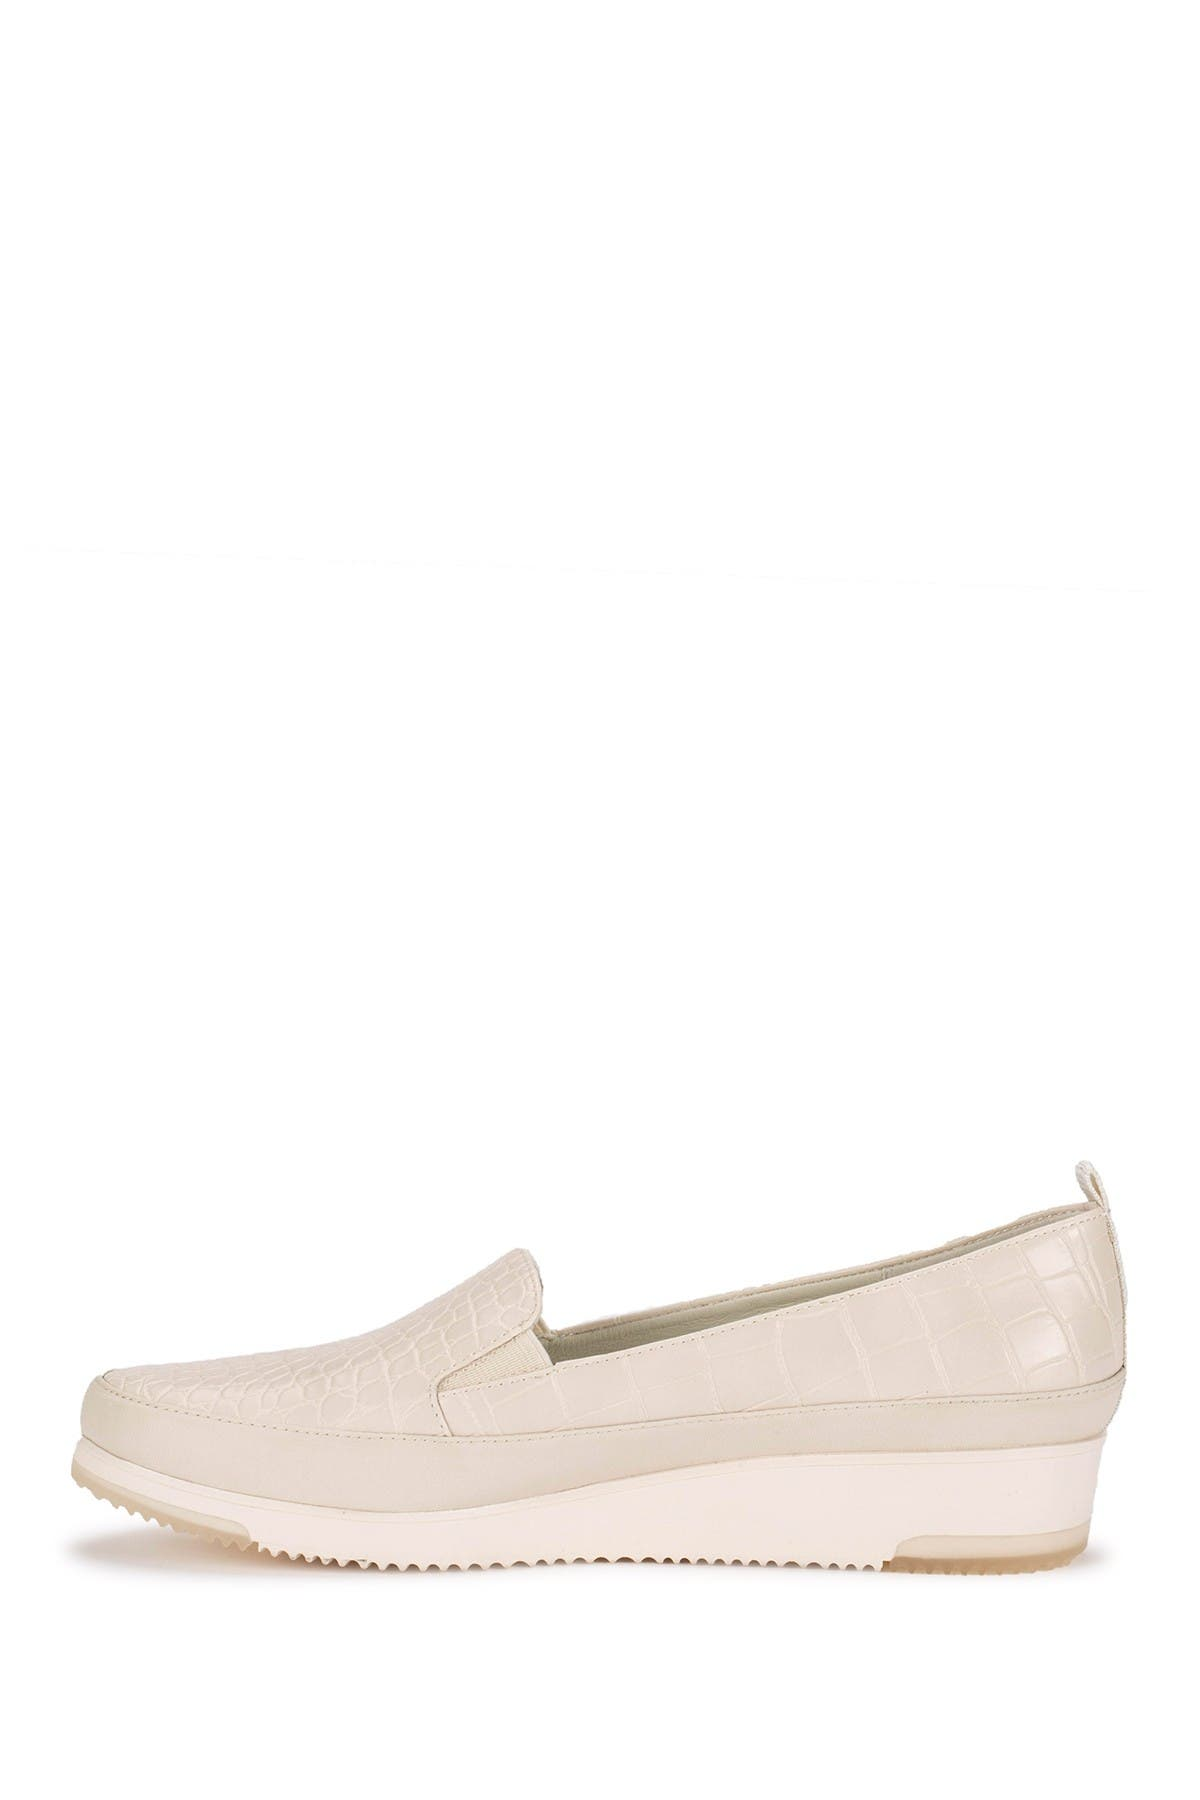 Baretraps Low heels HOPE CASUAL SLIP-ON LOAFER